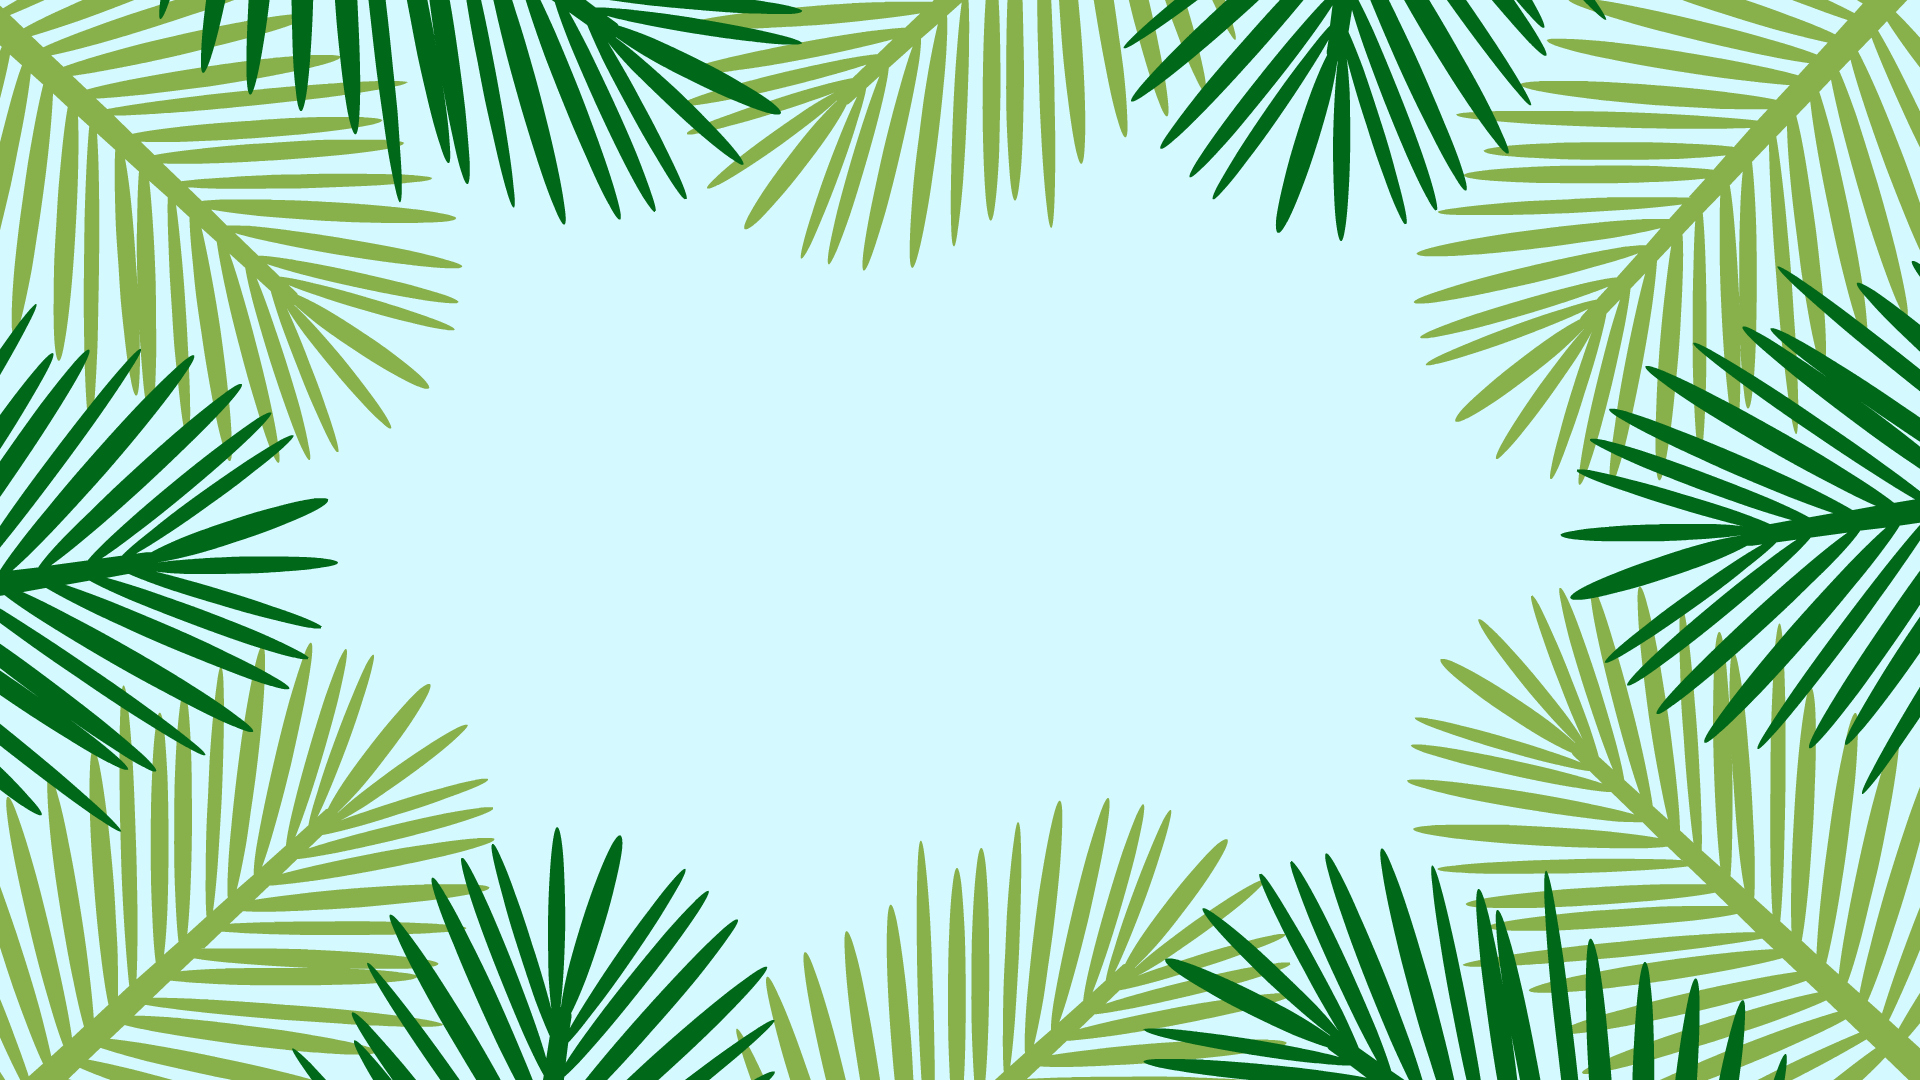 Cute Pattern Desktop Backgrounds 1920x1080 Wallpaper Teahub Io